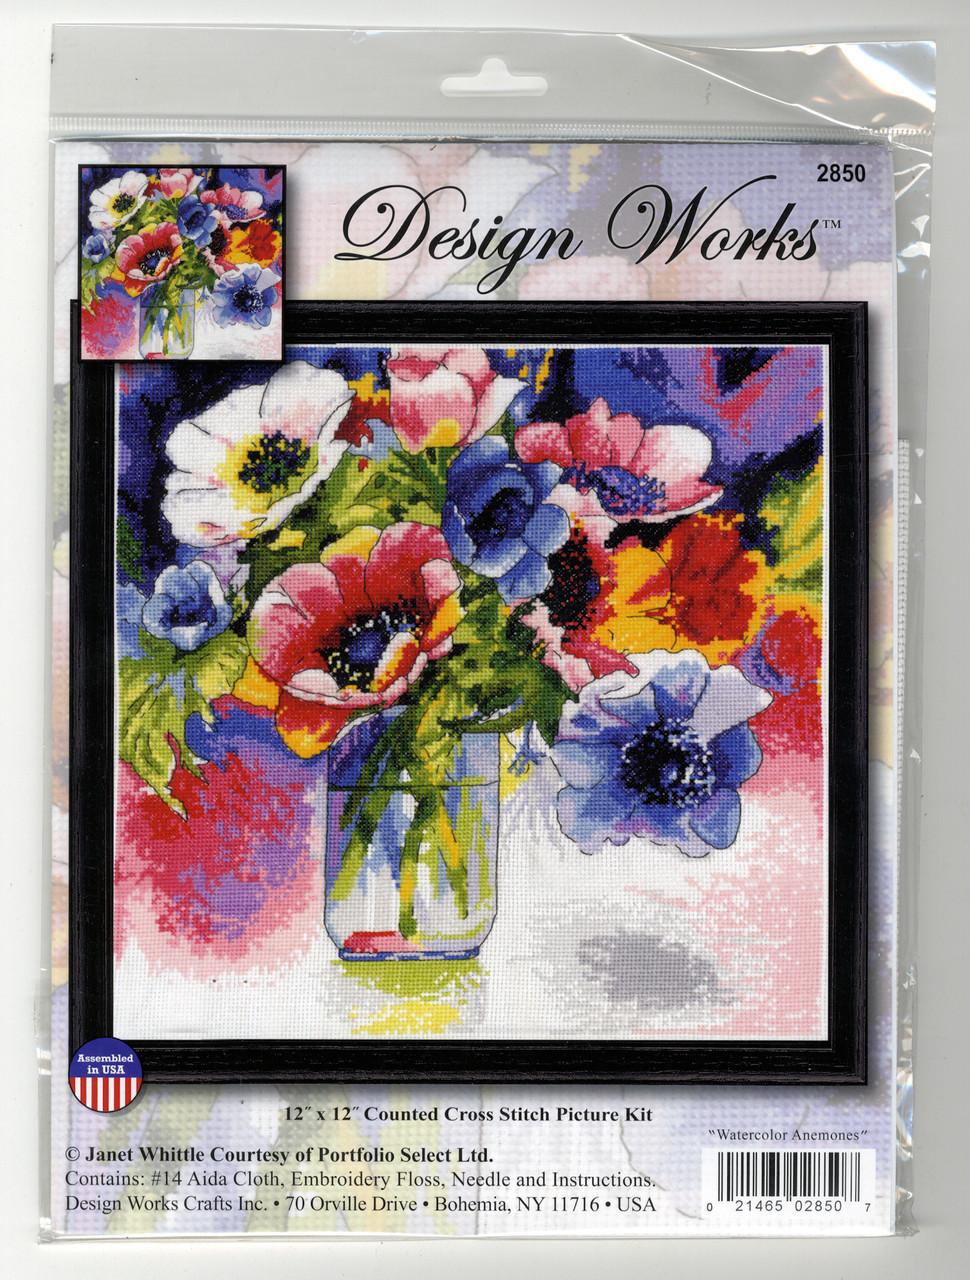 Design Works - Anemones